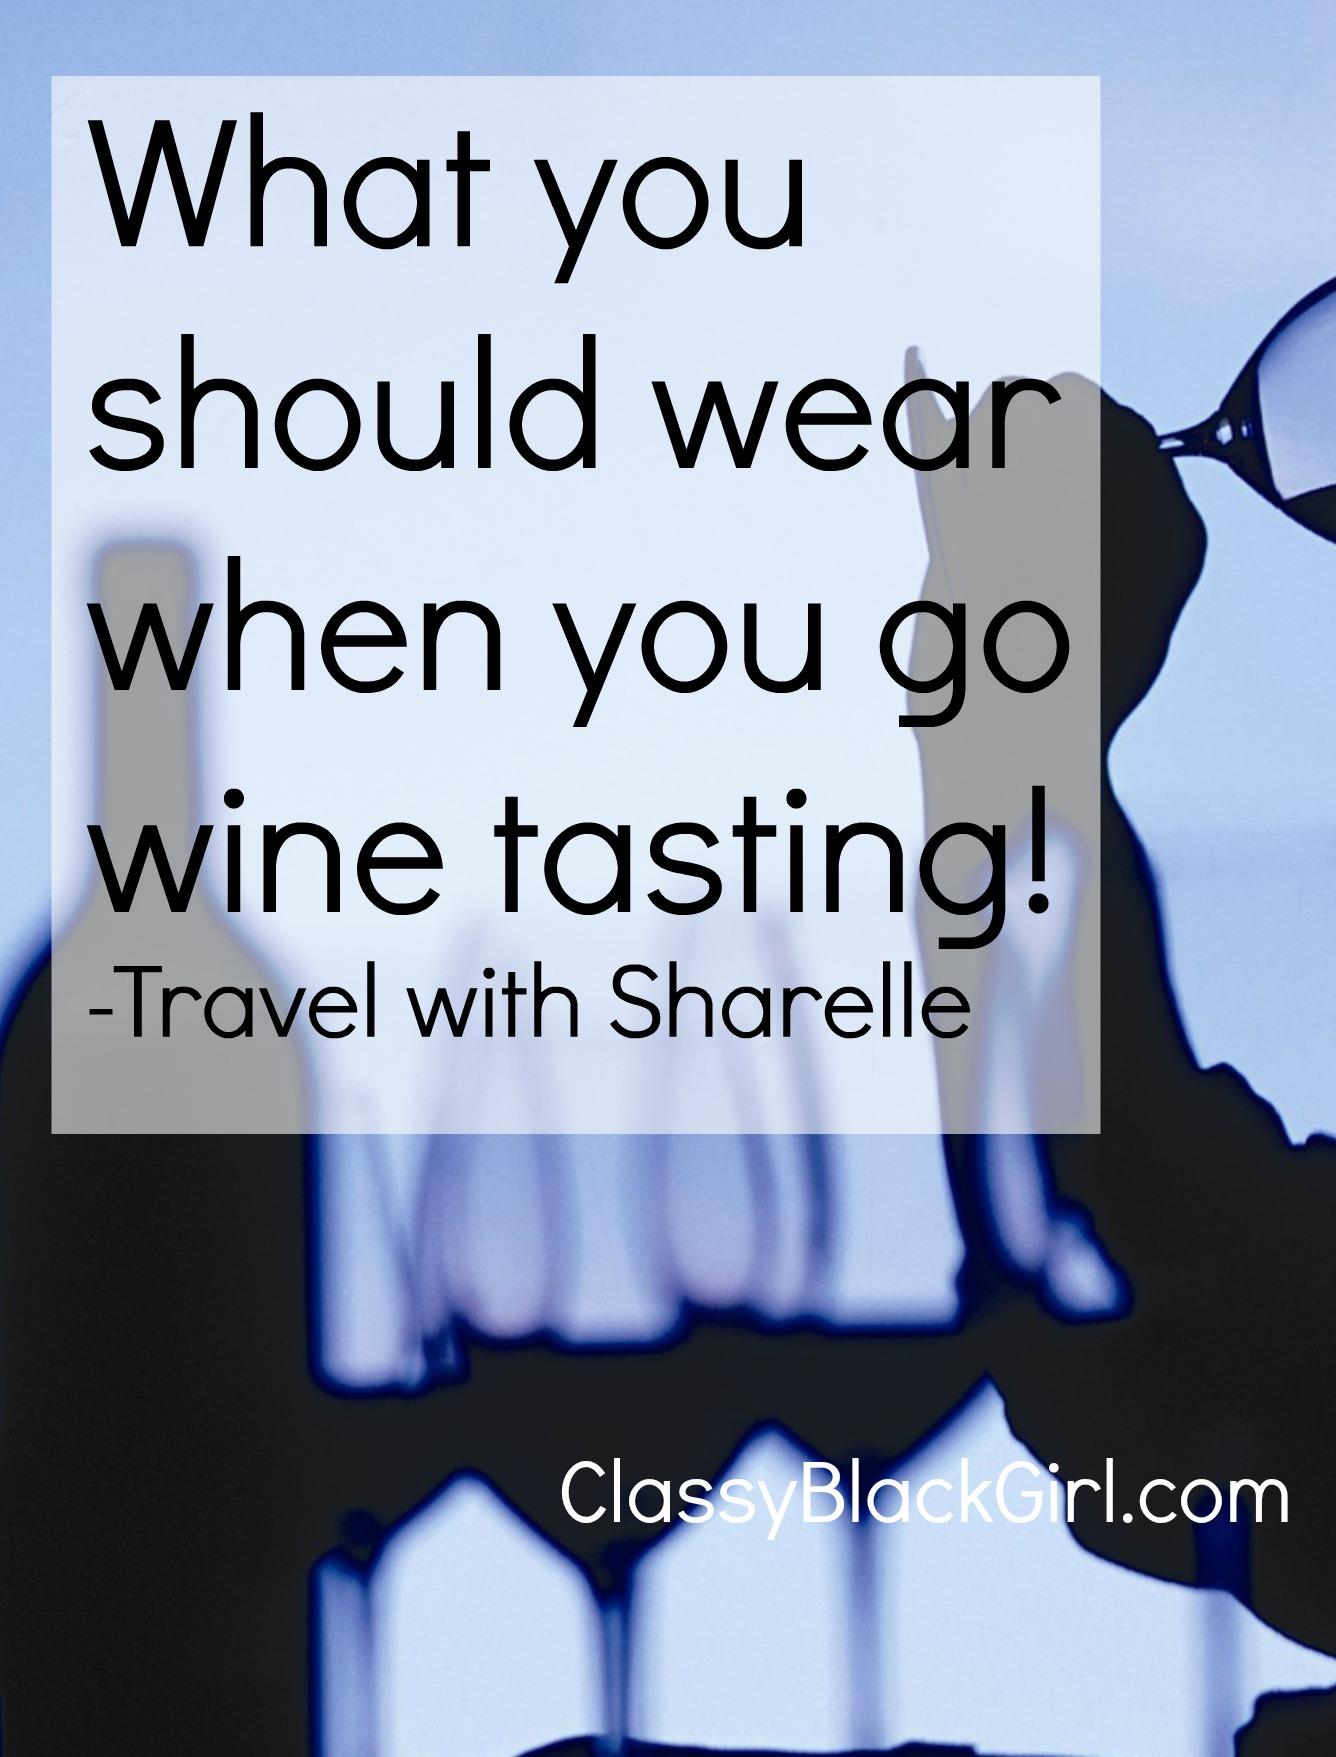 What to wear when wine tasting classyblackgirl